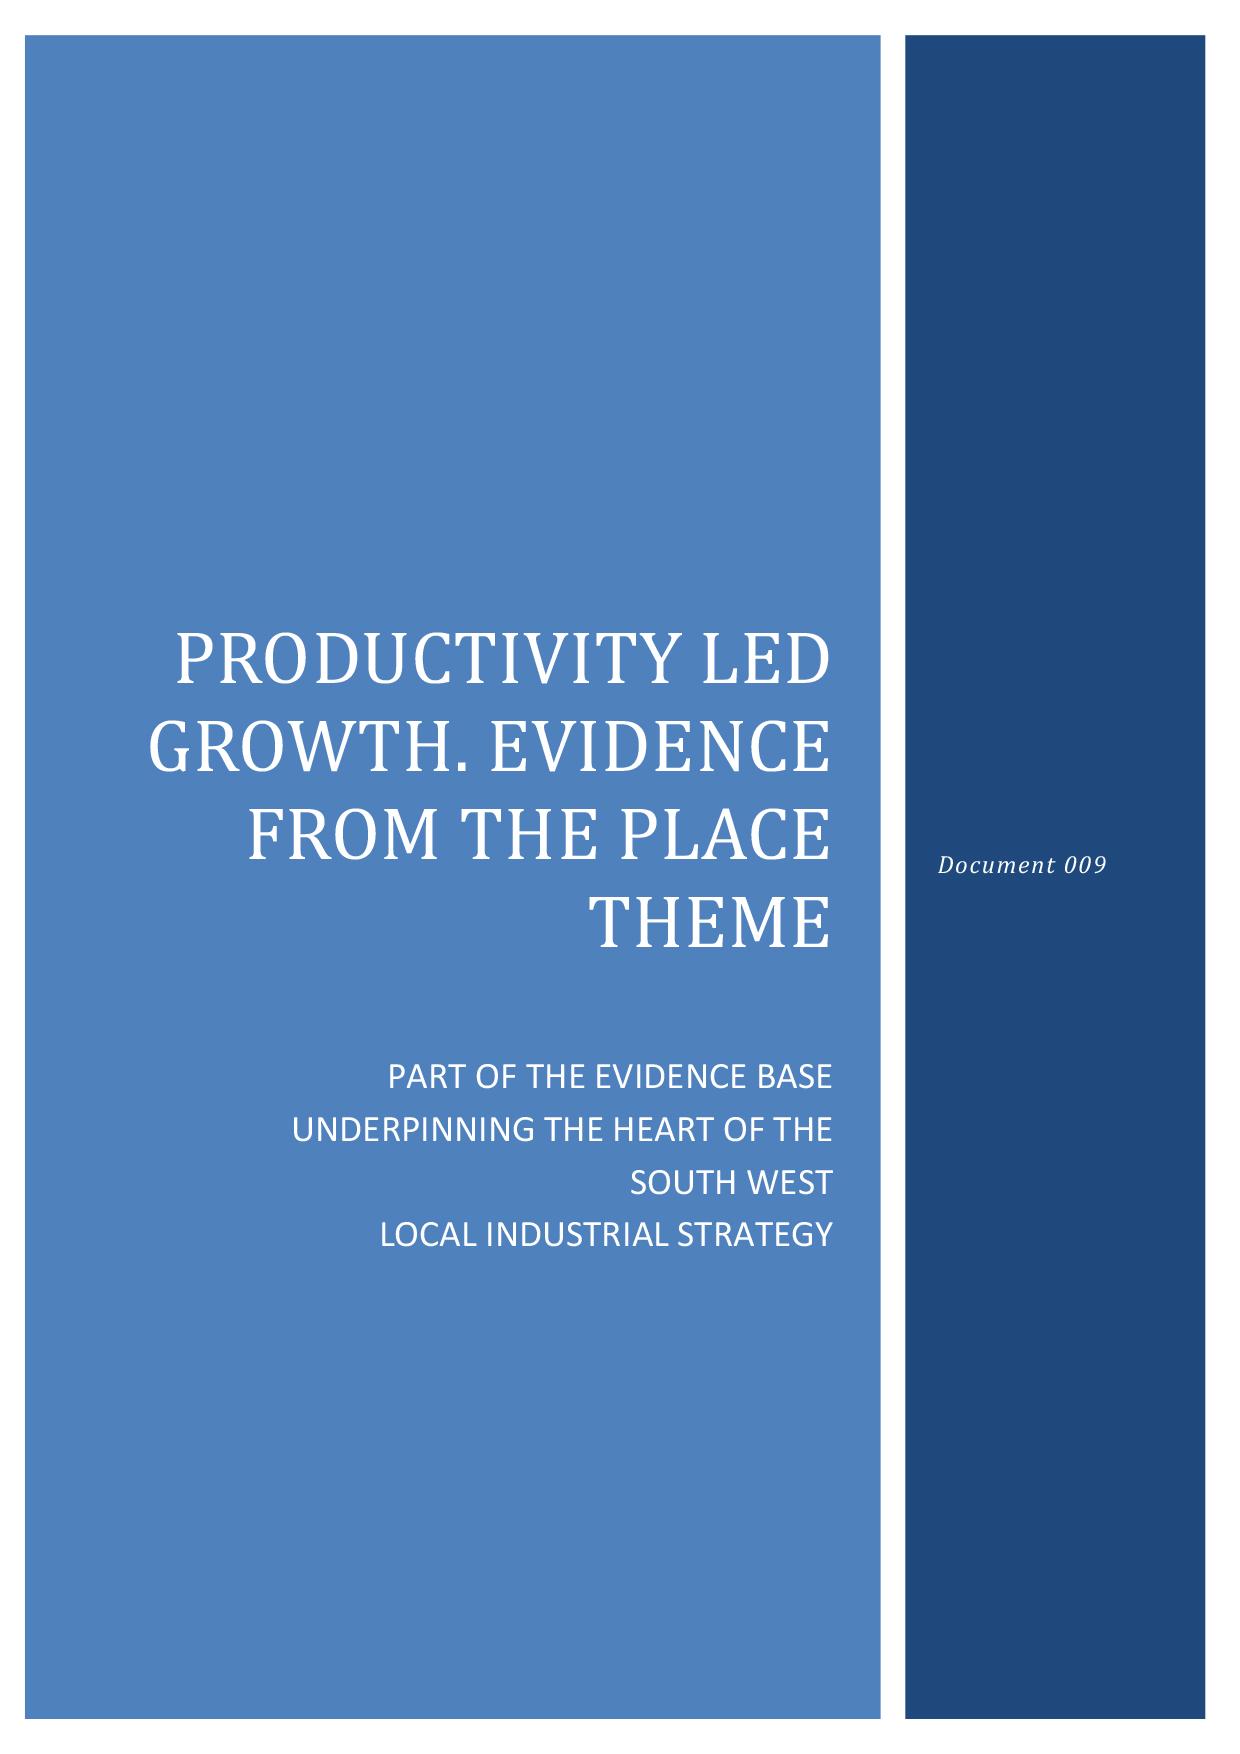 Microsoft Word - 009 Productivity-led Growth (place theme)